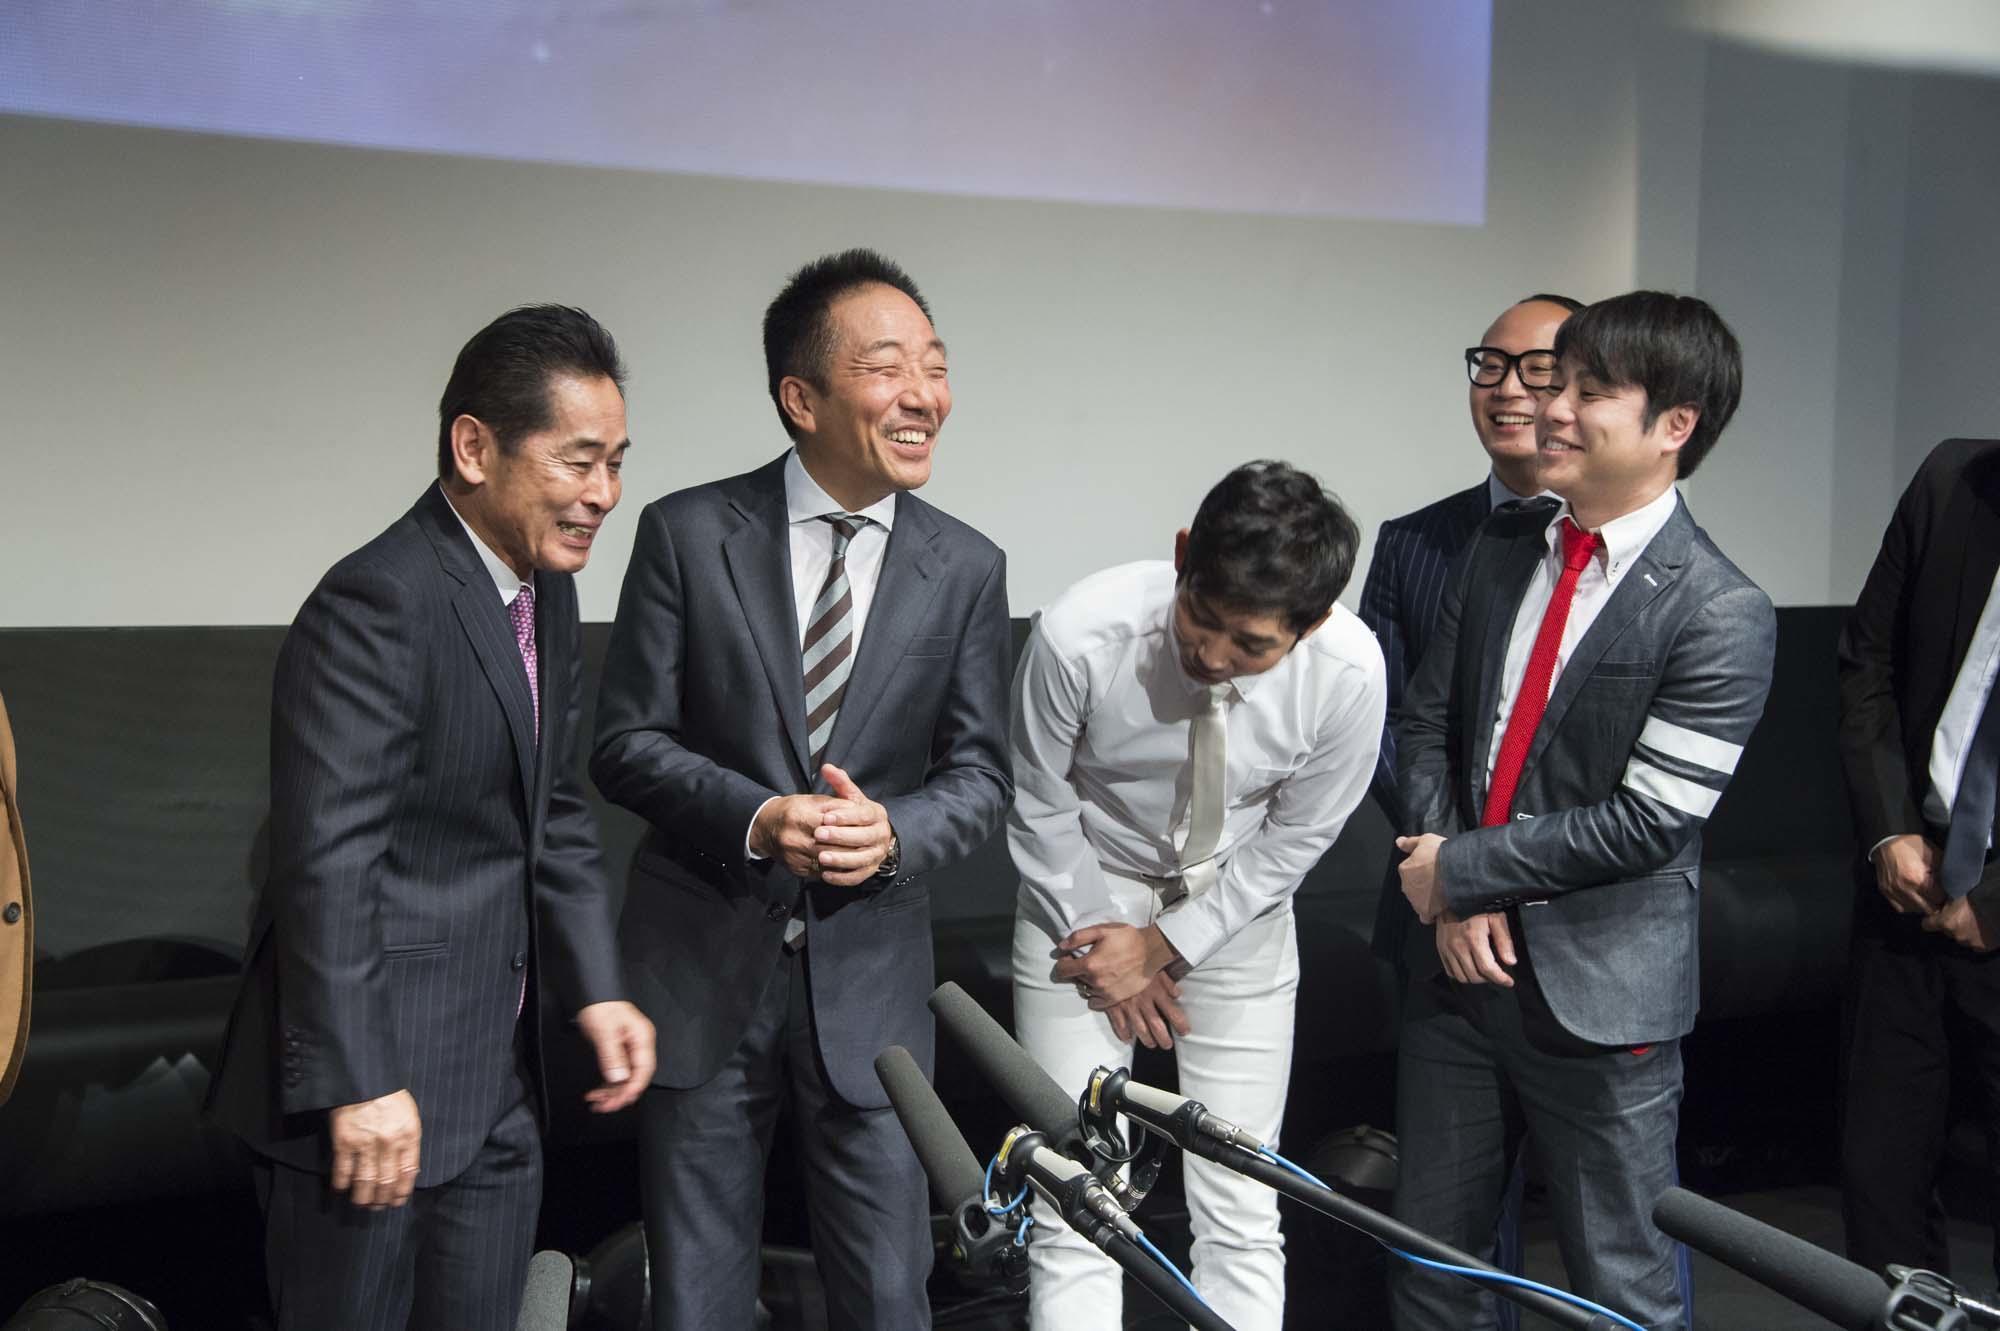 http://news.yoshimoto.co.jp/20171110142546-ffbe5a5c1a0037caa4c2c94fcd95c28e9c716c19.jpg